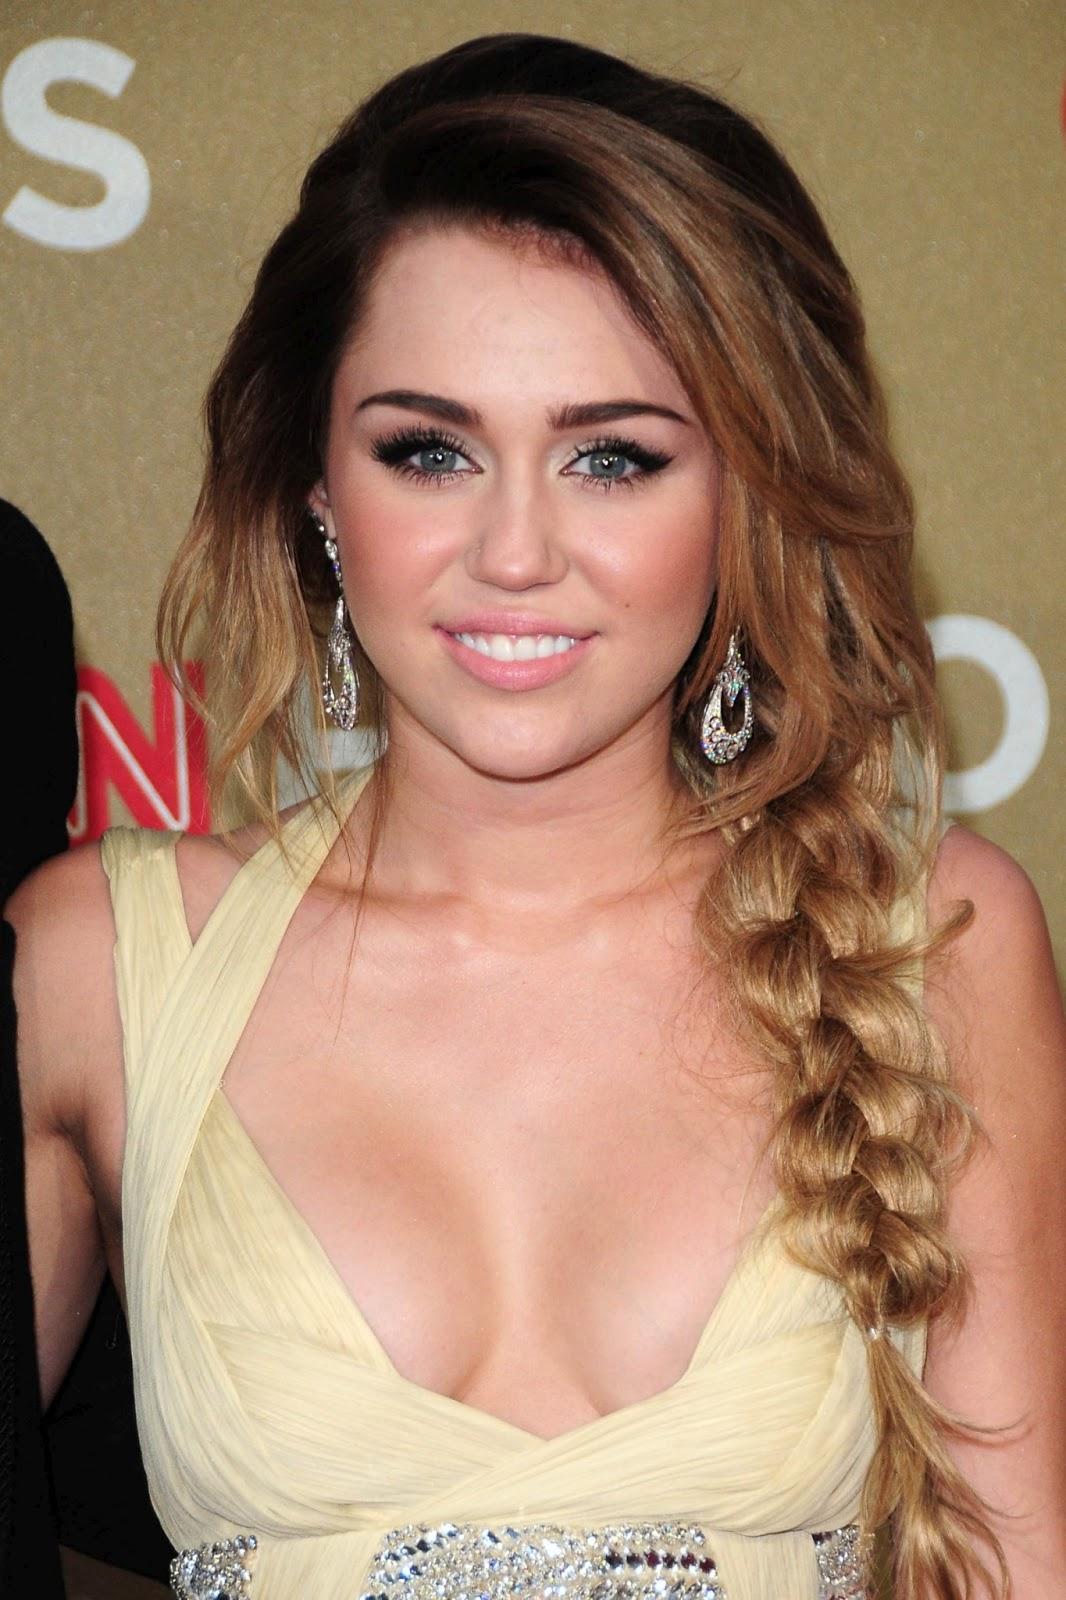 Miley Cyrus Breast Pics